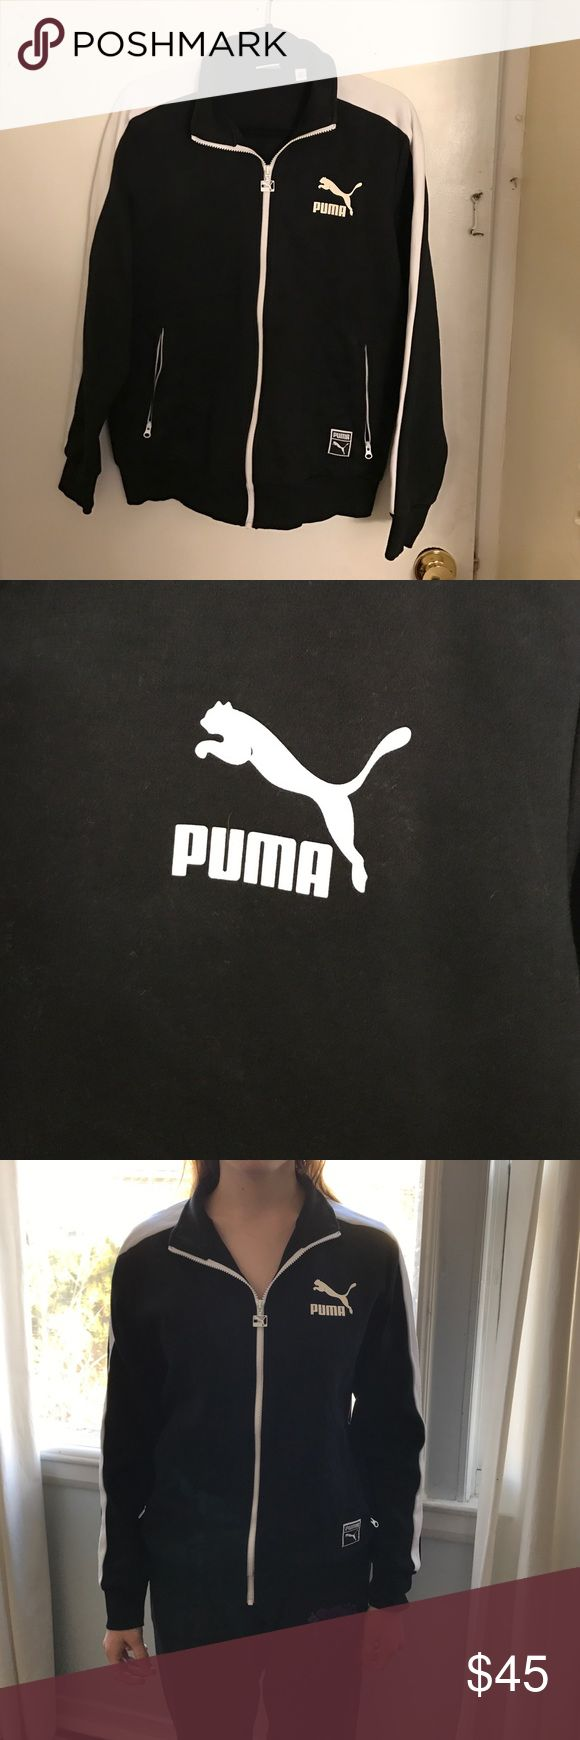 A Puma sweatshirt It's a black Puma sweatshirt with white strips going down both arms. Puma Jackets & Coats